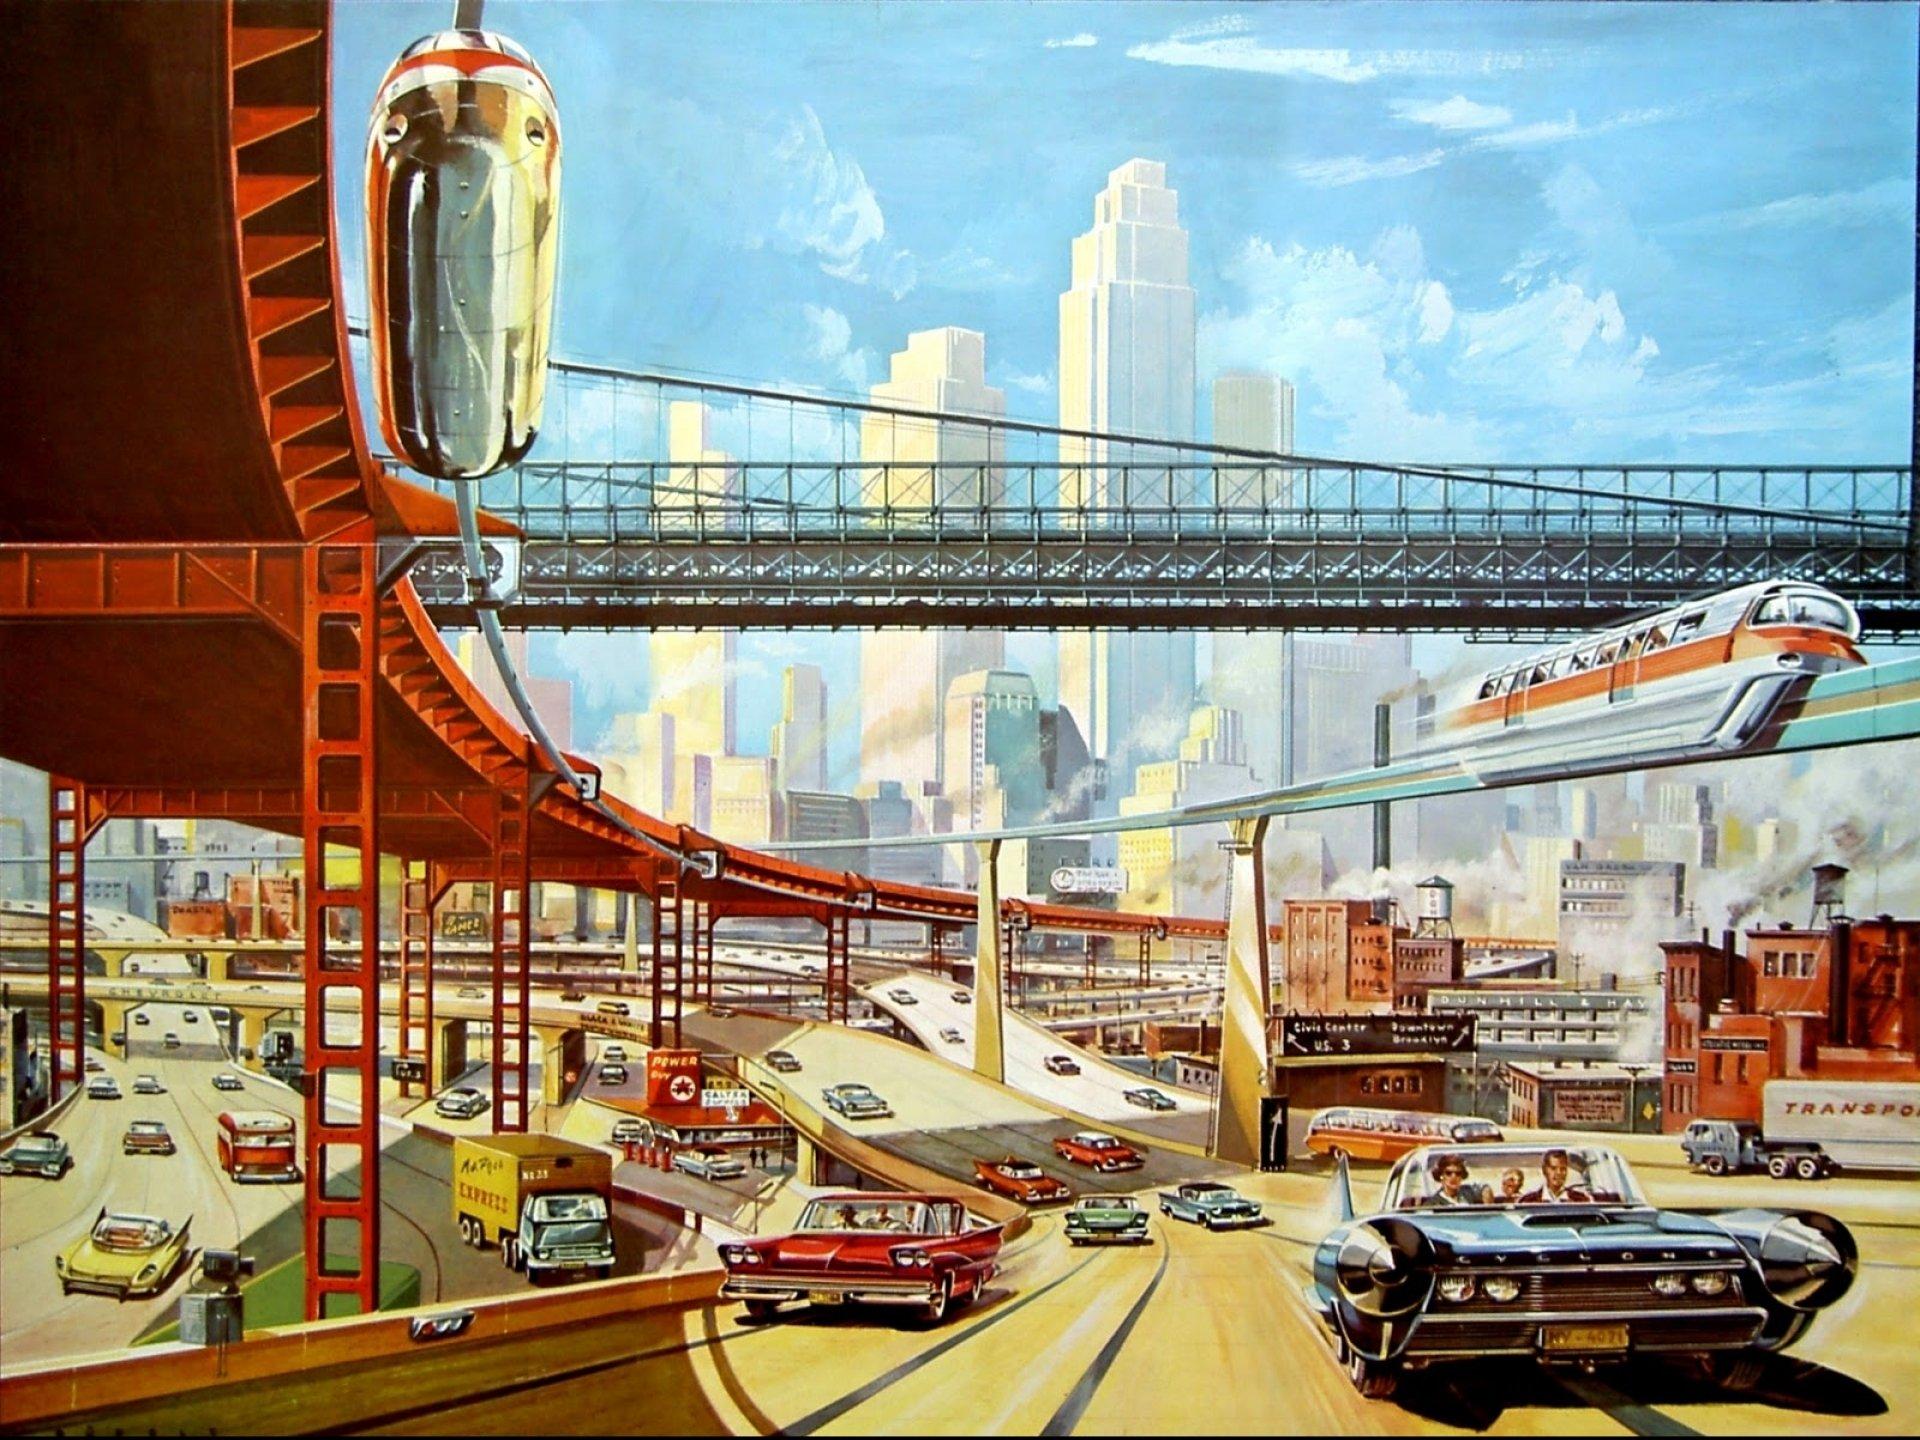 Sci Fi Futuristic City Cities Art Artwork Wallpaper